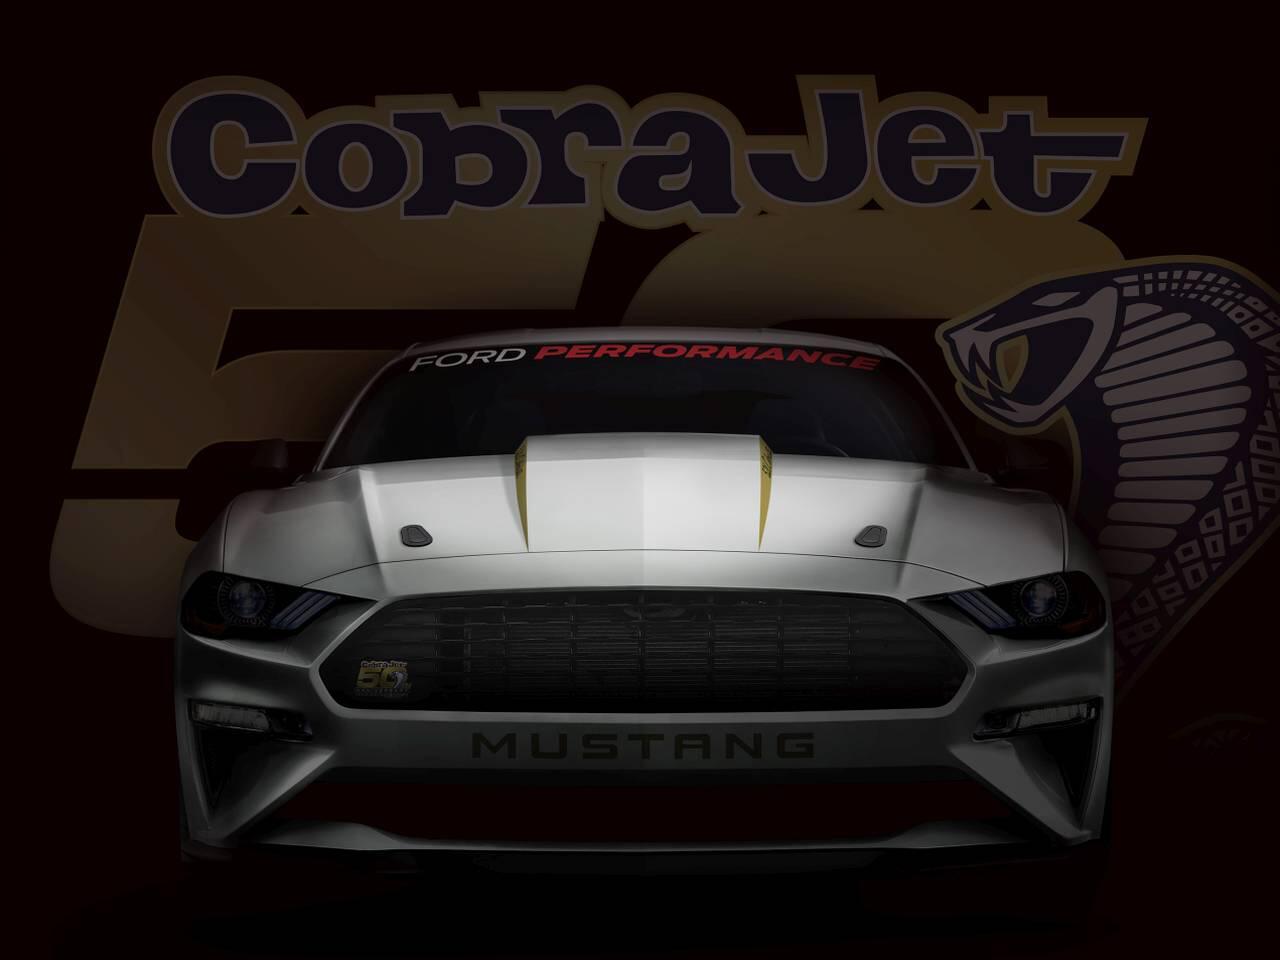 Bild zu Ford Mustang Cobra Jet